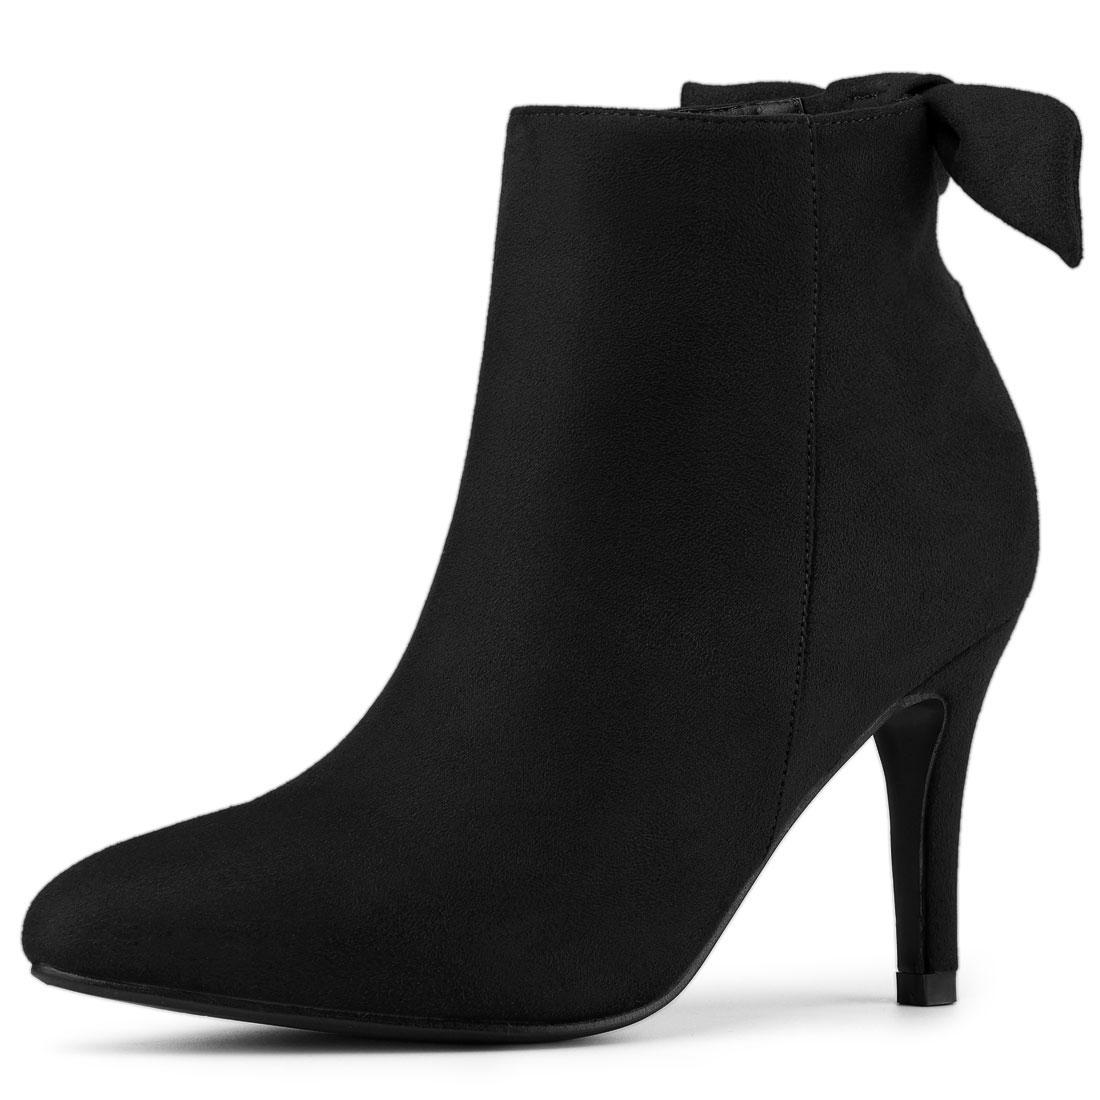 Allegra K Women's Pointed Toe Stiletto Heel Ankle Boots Black US 5.5